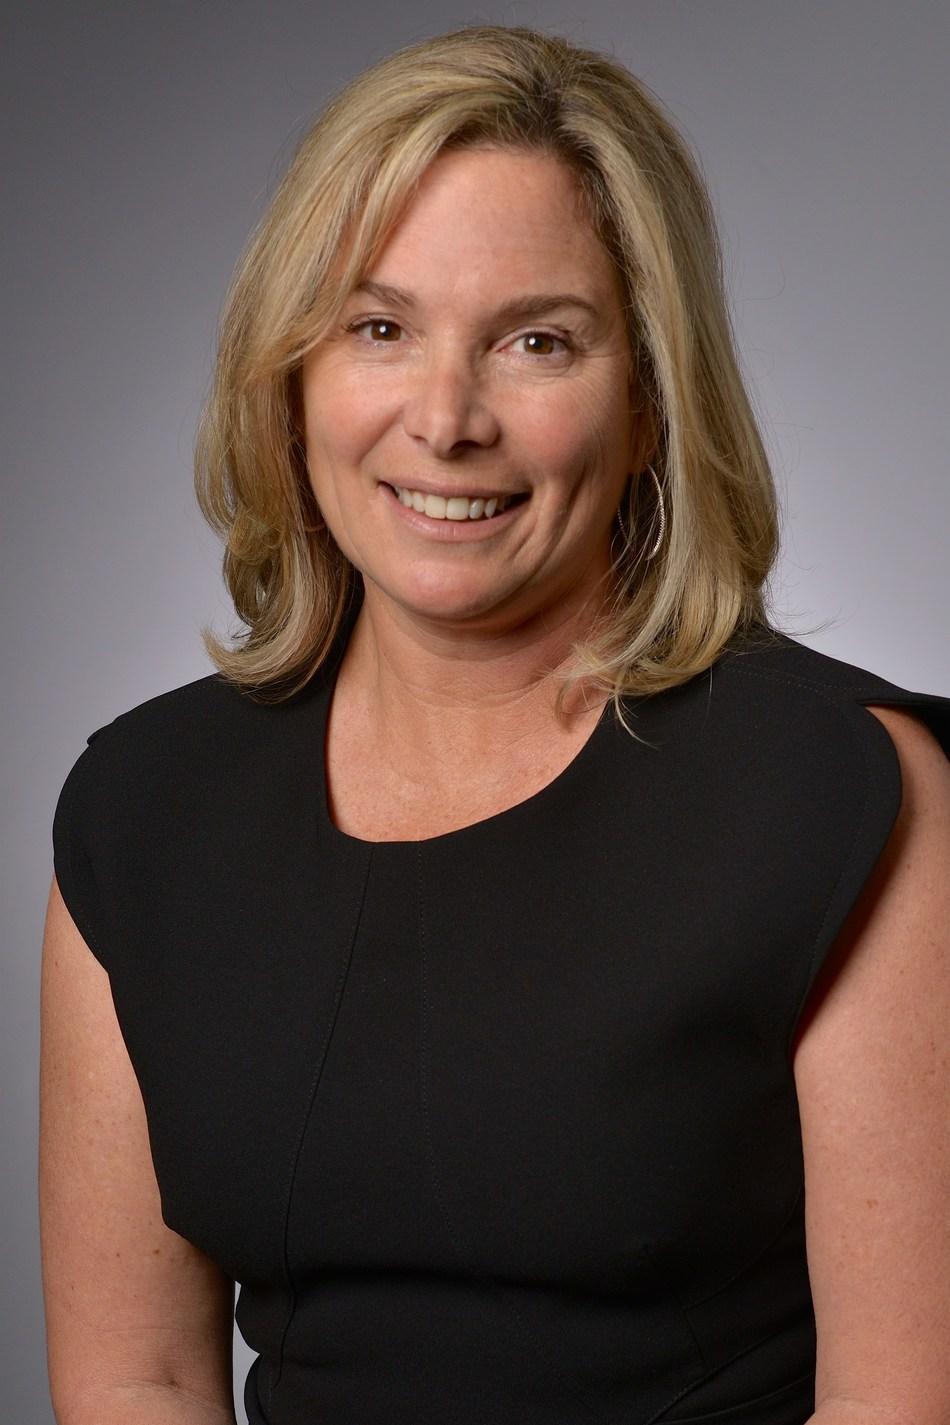 Debbie Demchak, Highmark Health Board of Directors